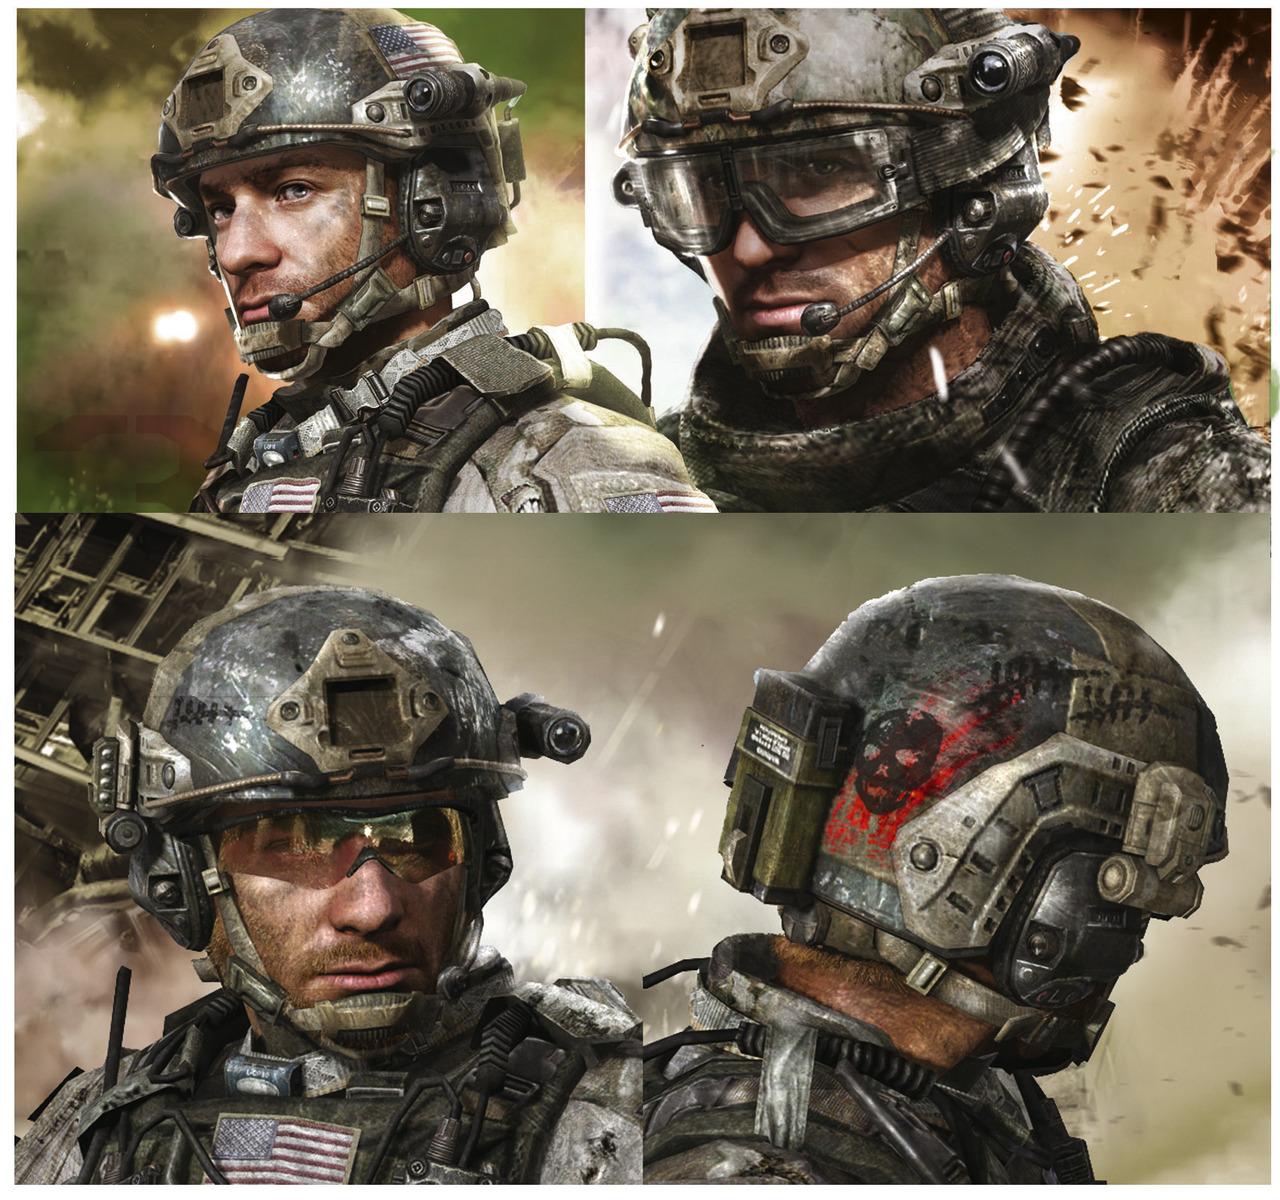 [Jeu Vidéo] Call of Duty : Modern Warfare 3 Call-of-duty-modern-warfare-3-playstation-3-ps3-1305357757-001